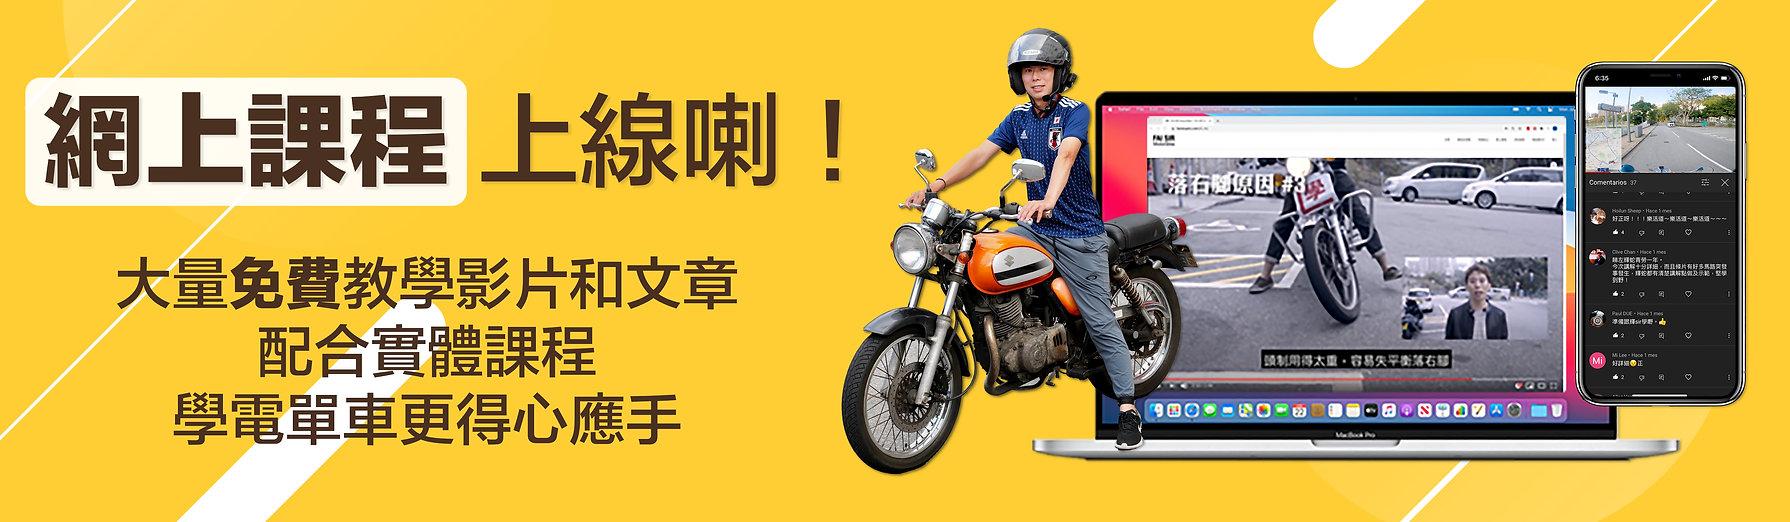 fansir -homepage-banner.jpg